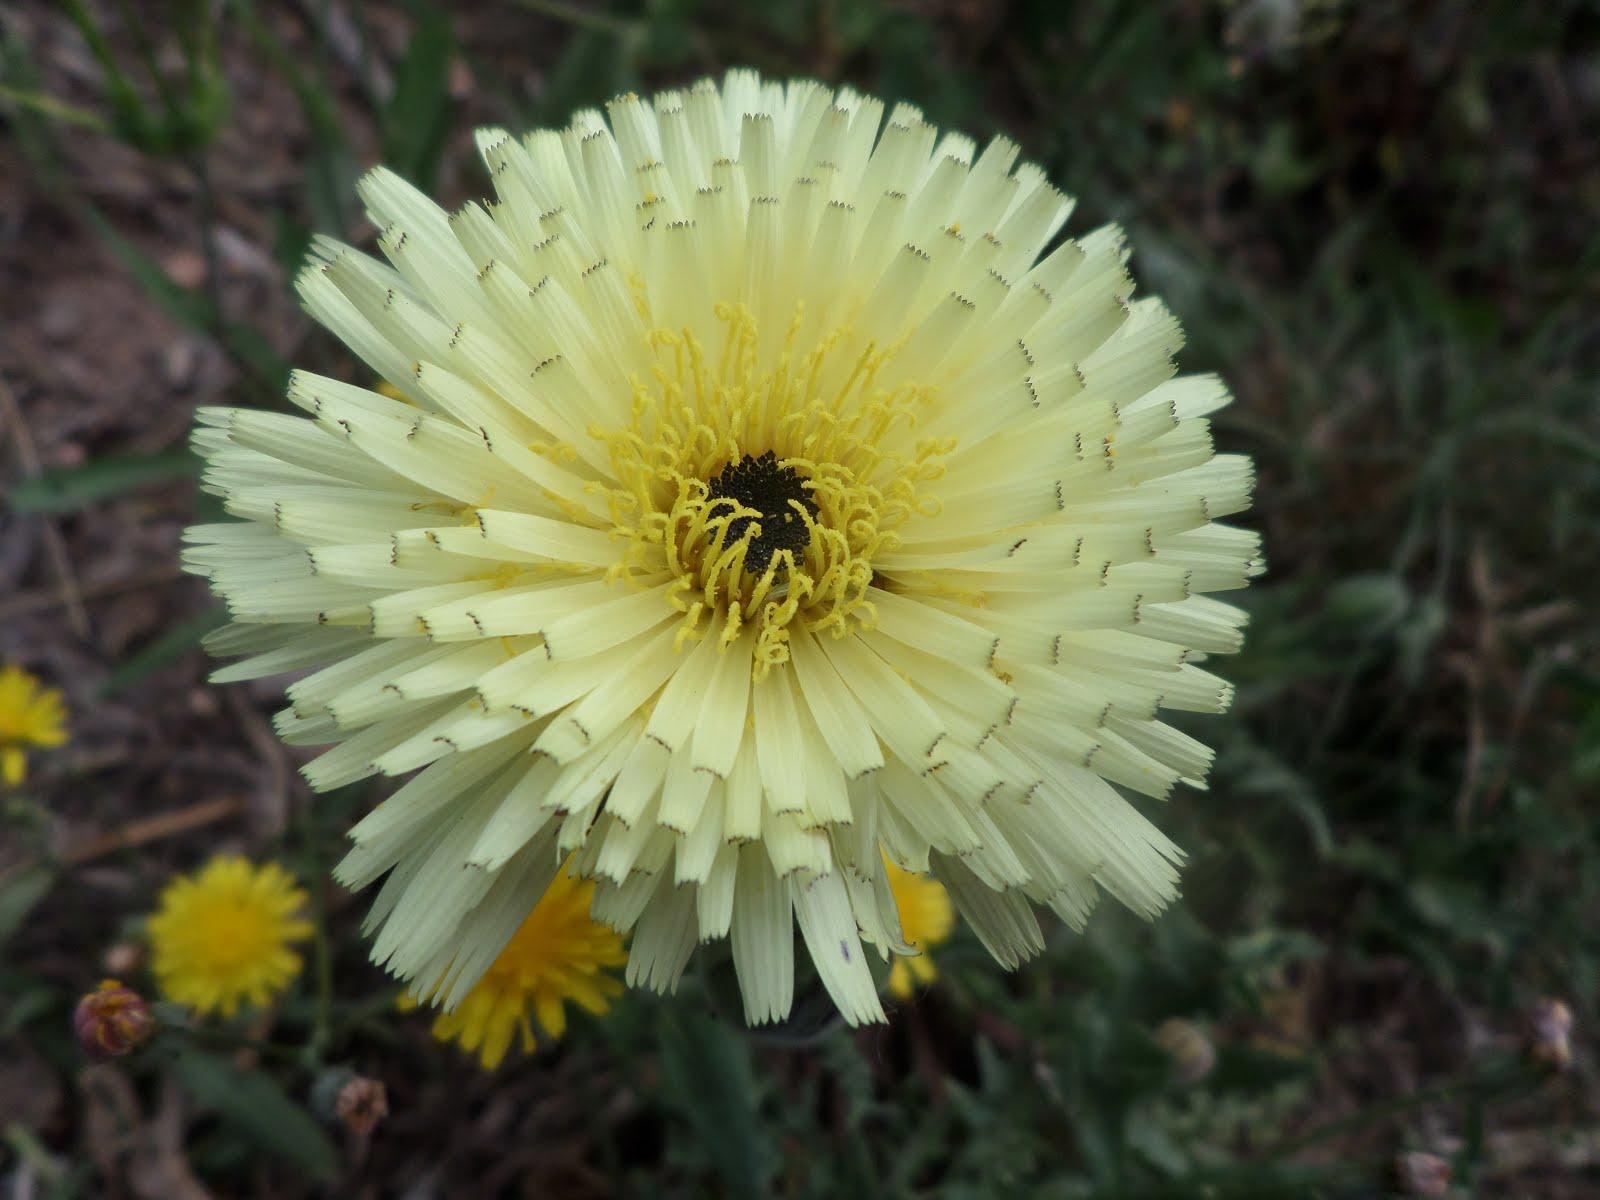 Flors grogues